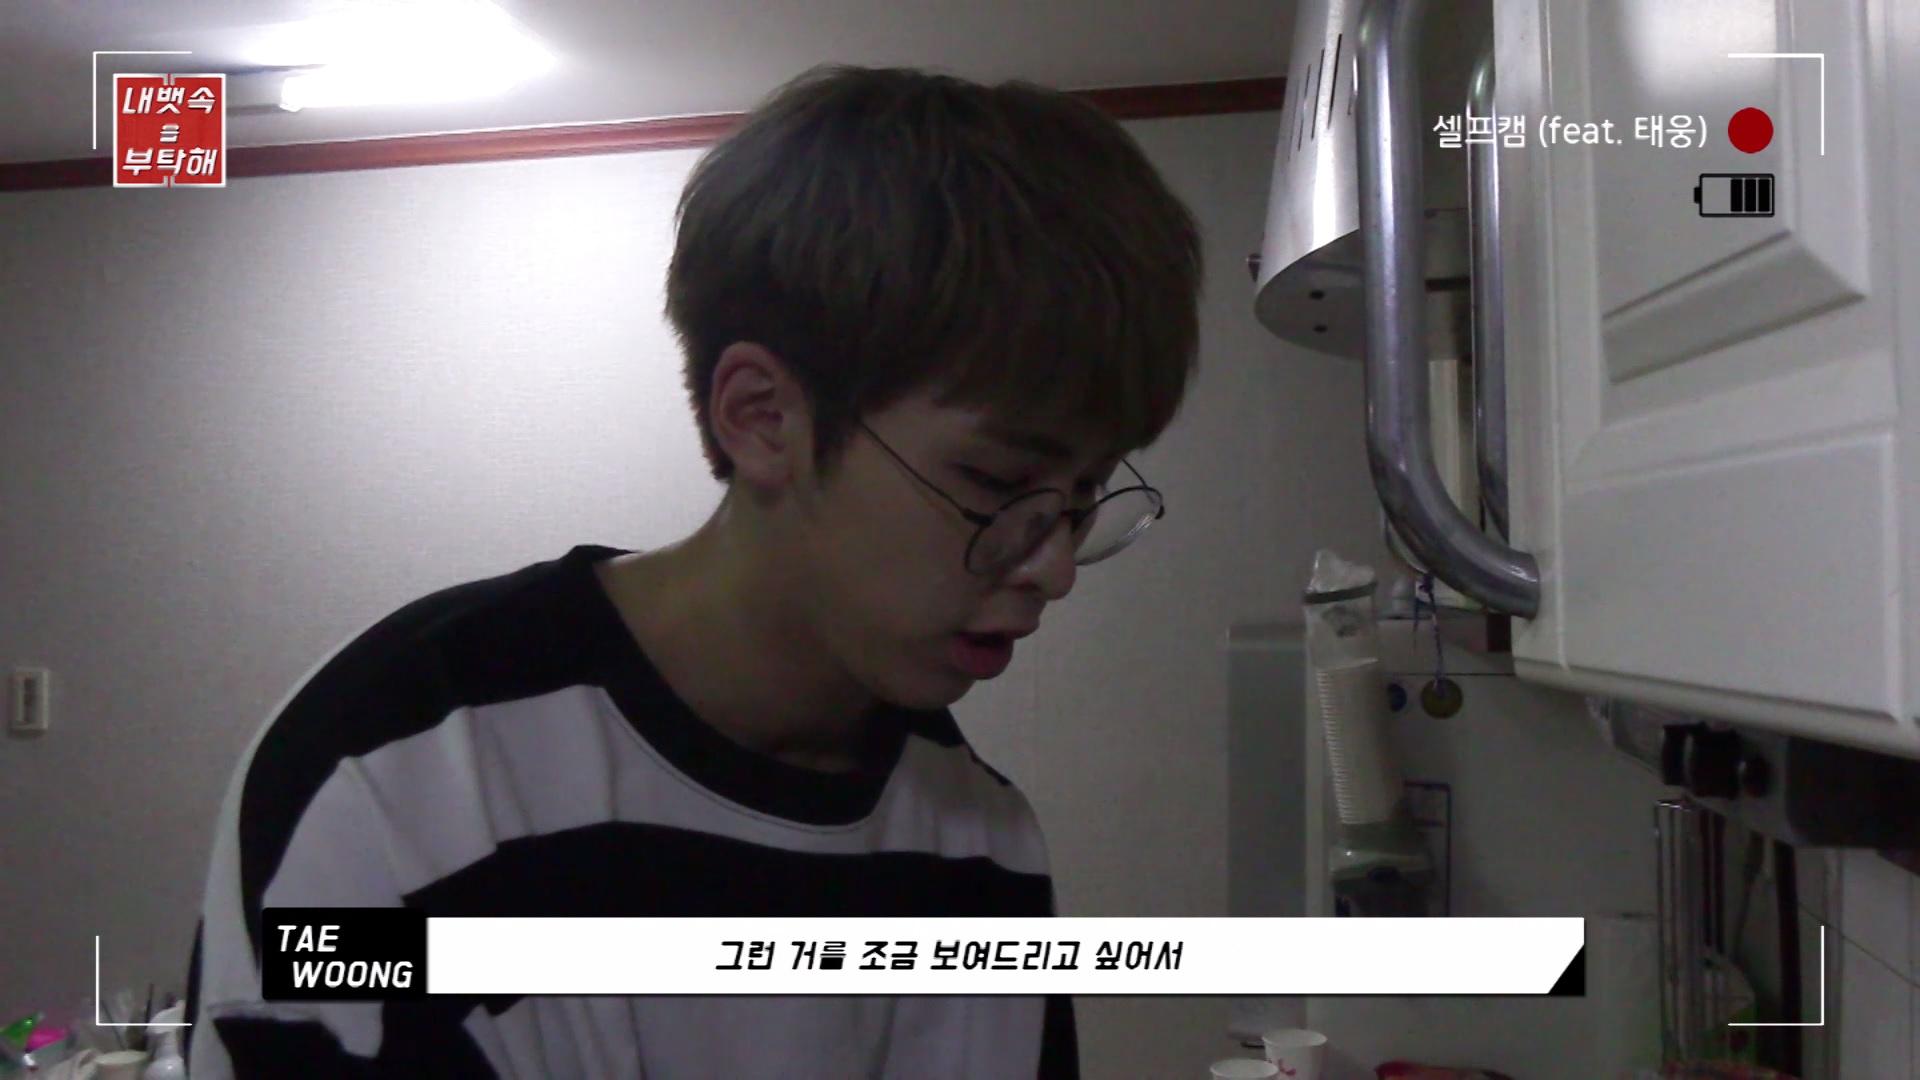 SNUPER(스누퍼) SELFCAM season5 태웅 요리 SPECIAL